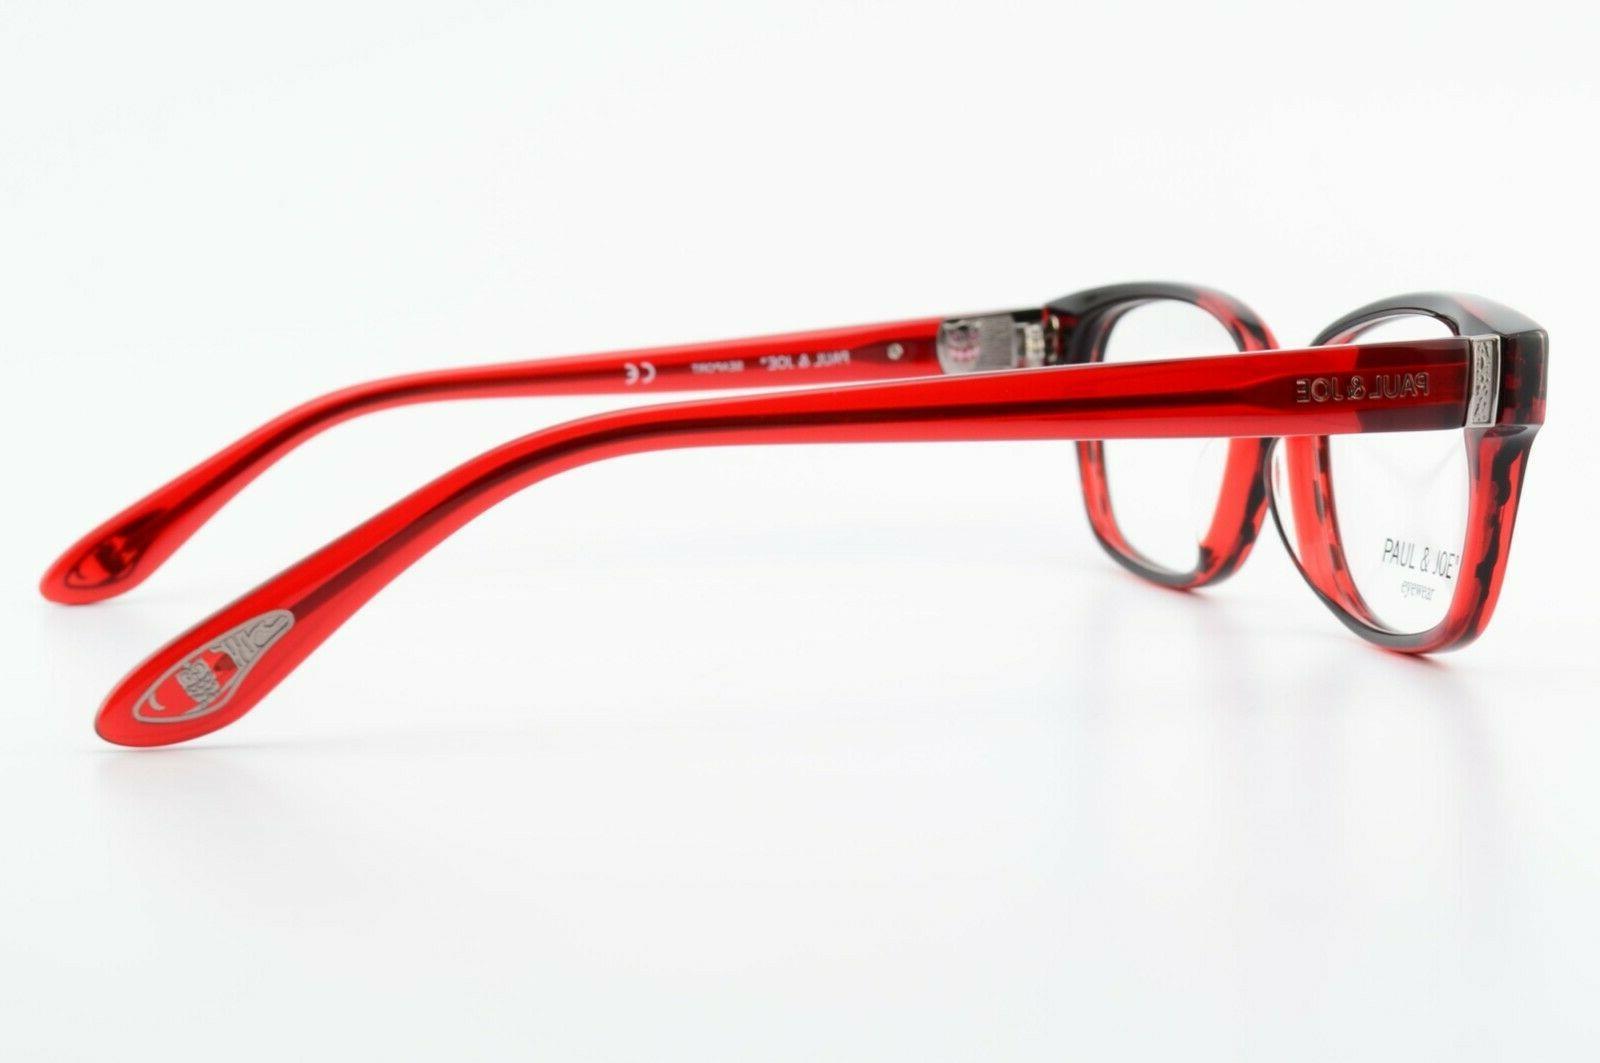 PAUL & JOE Glasses 49 Eye Frame